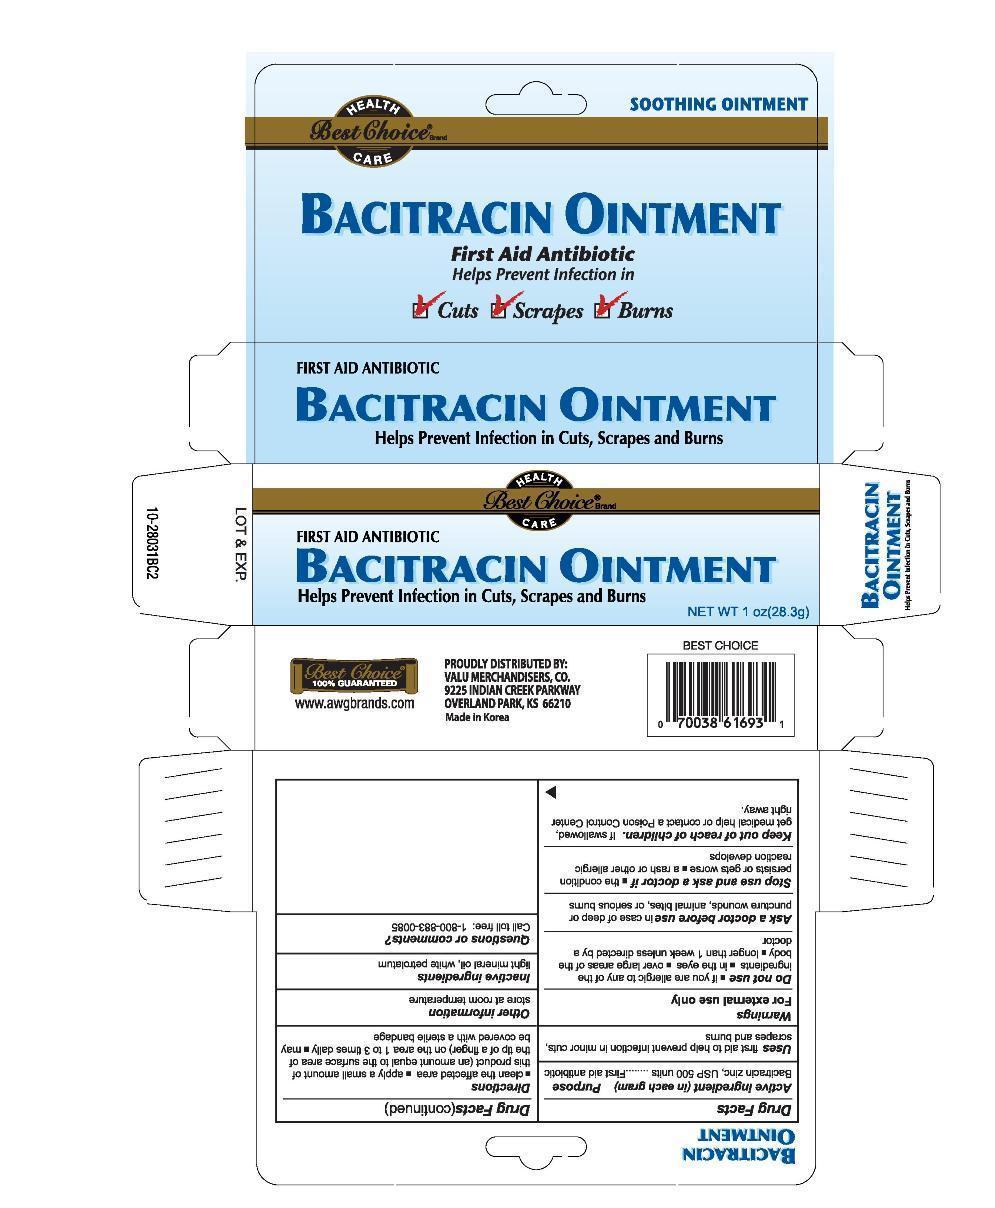 Best Choice Bacitracin Zinc (Bacitracin Zinc) Ointment [Valu Merchandisers, Co.]